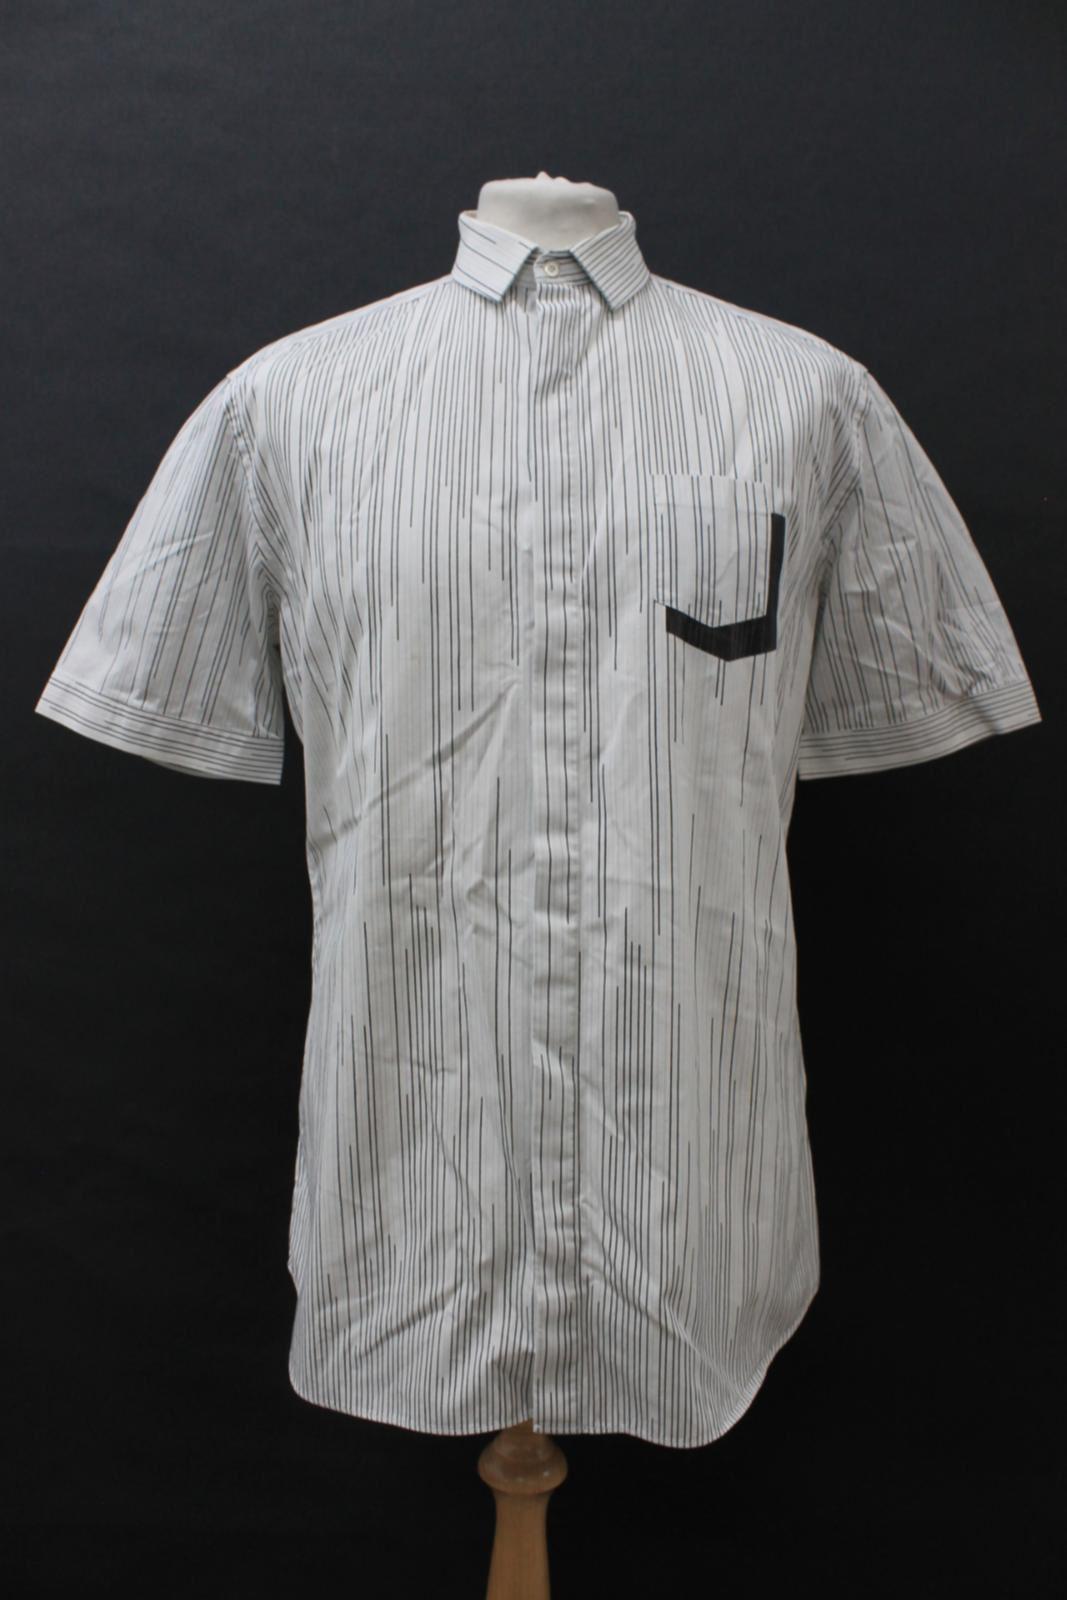 Neil-Barrett-Hombre-Blanco-Algodon-De-Rayas-Camisa-De-Manga-Corta-Estampado-de-bolsillo-16-5-034